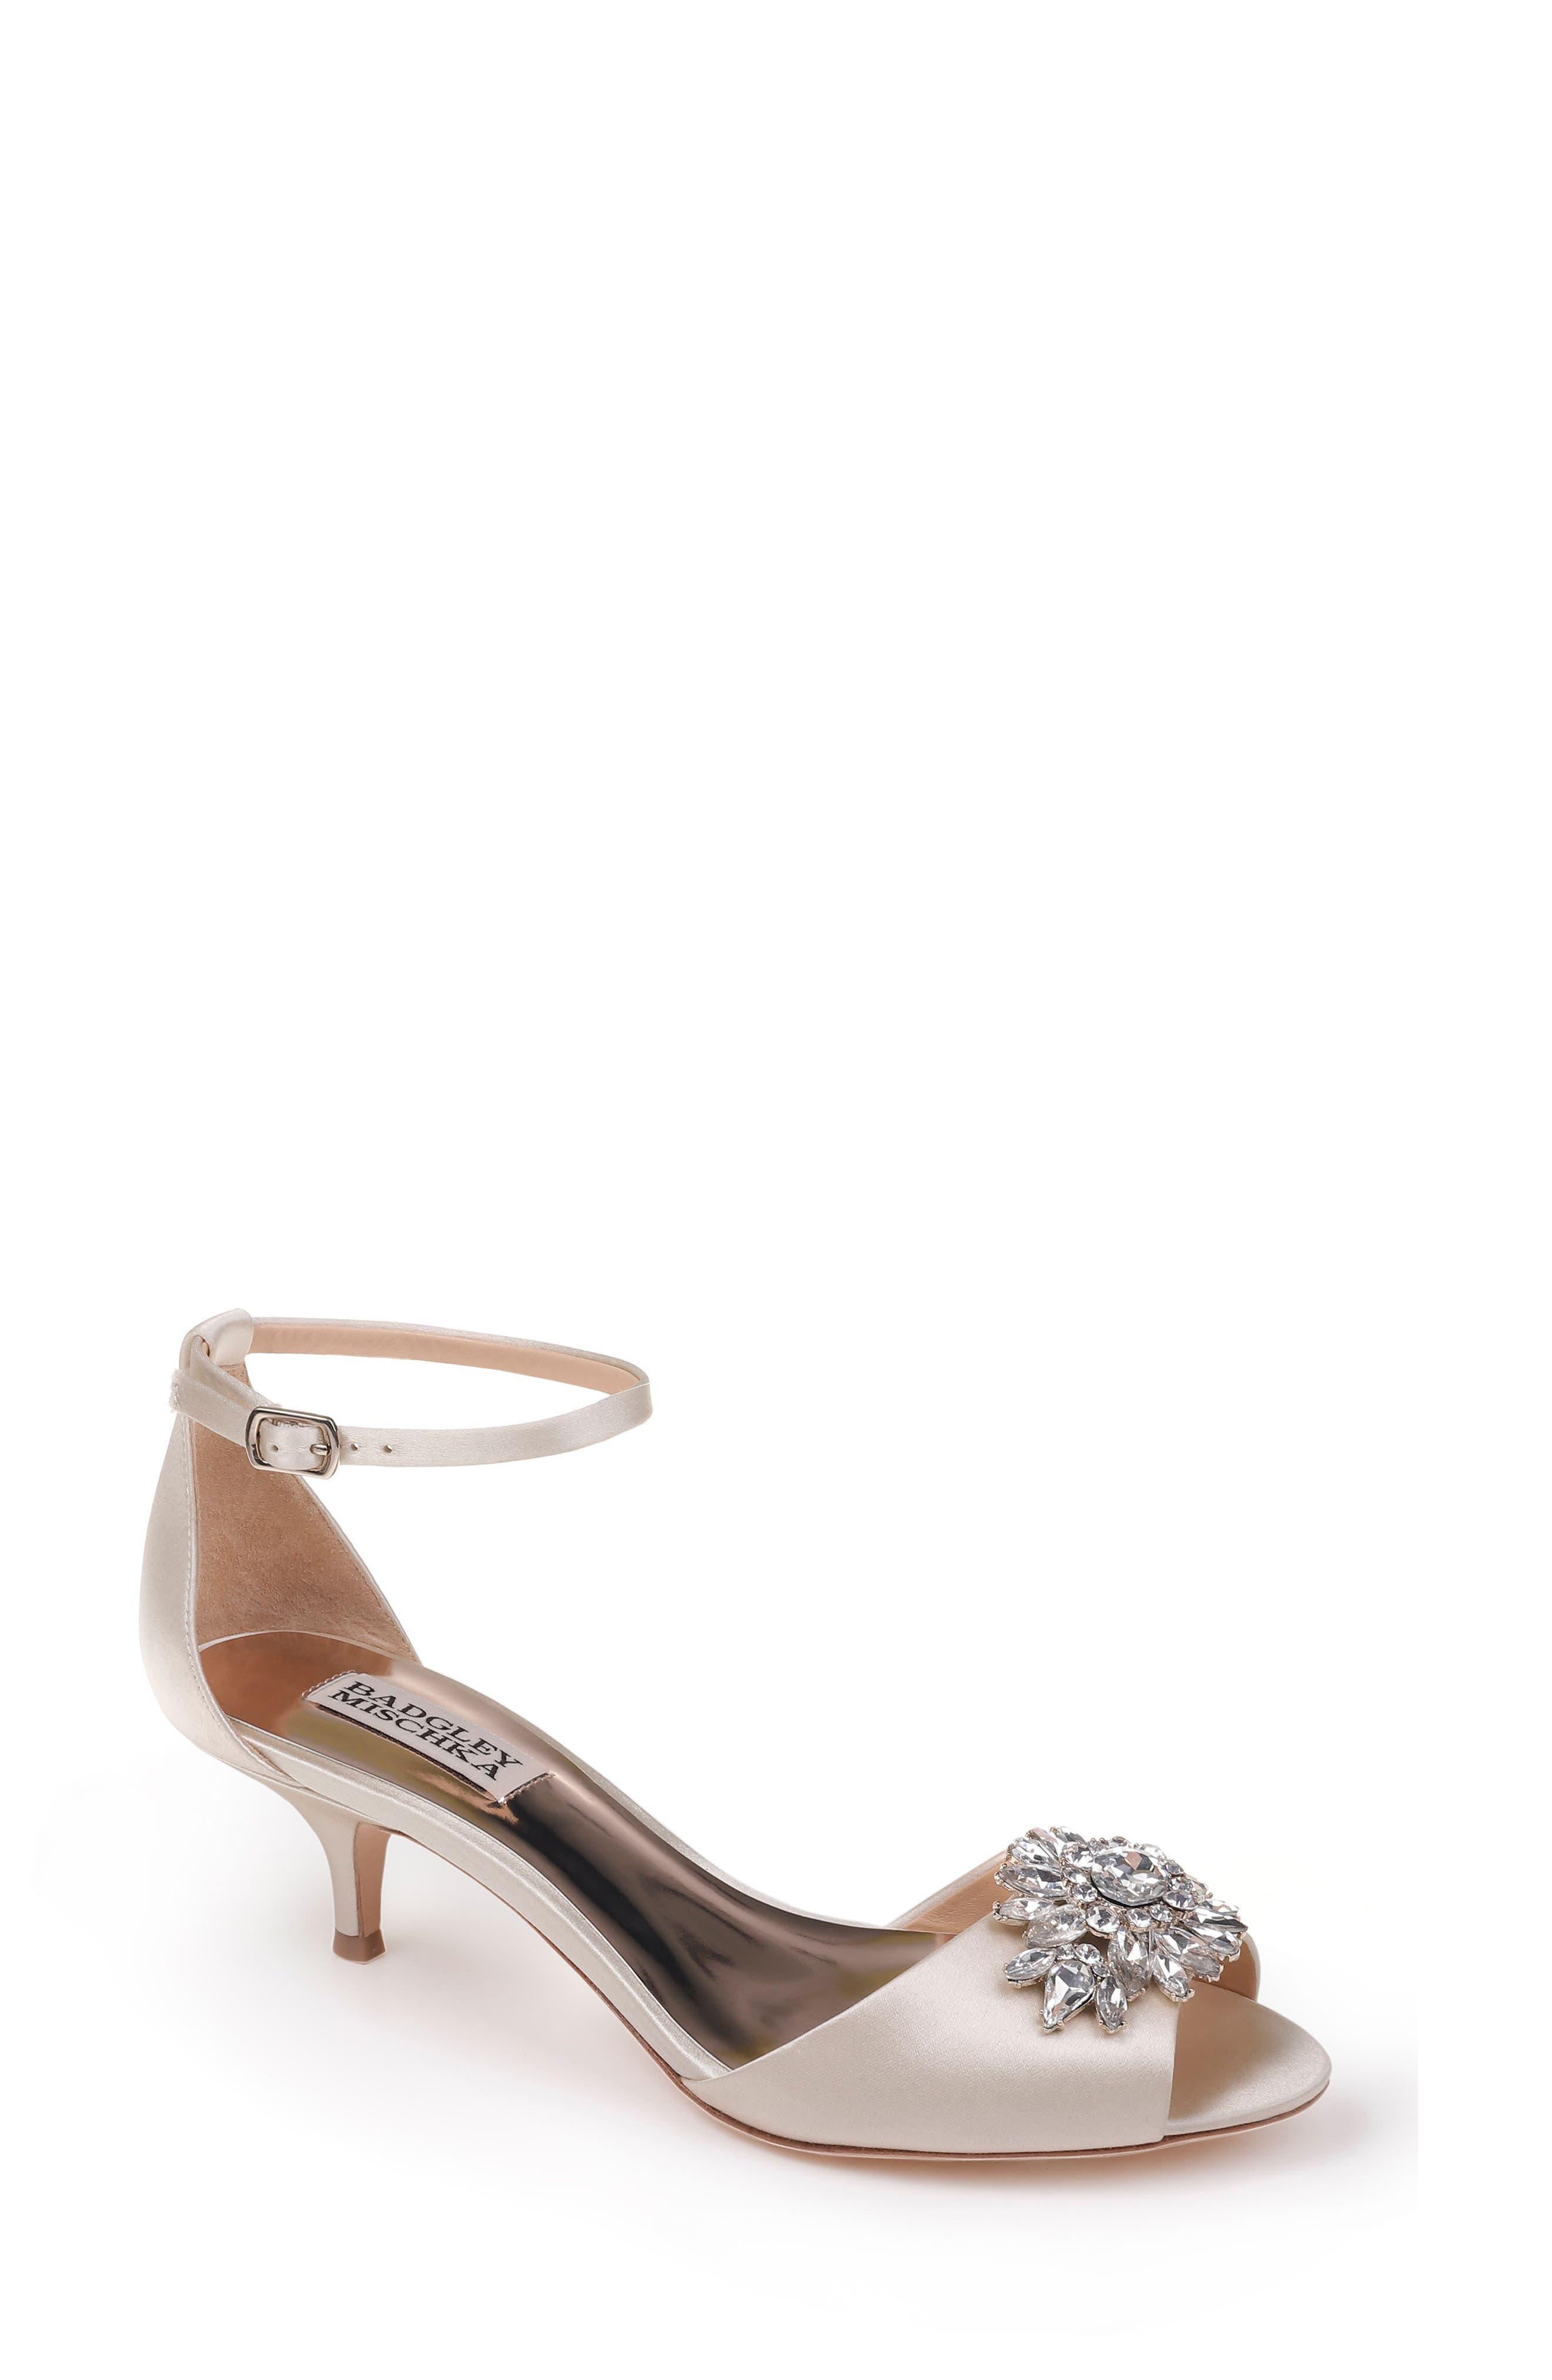 Sainte Crystal Embellished Sandal,                             Main thumbnail 2, color,